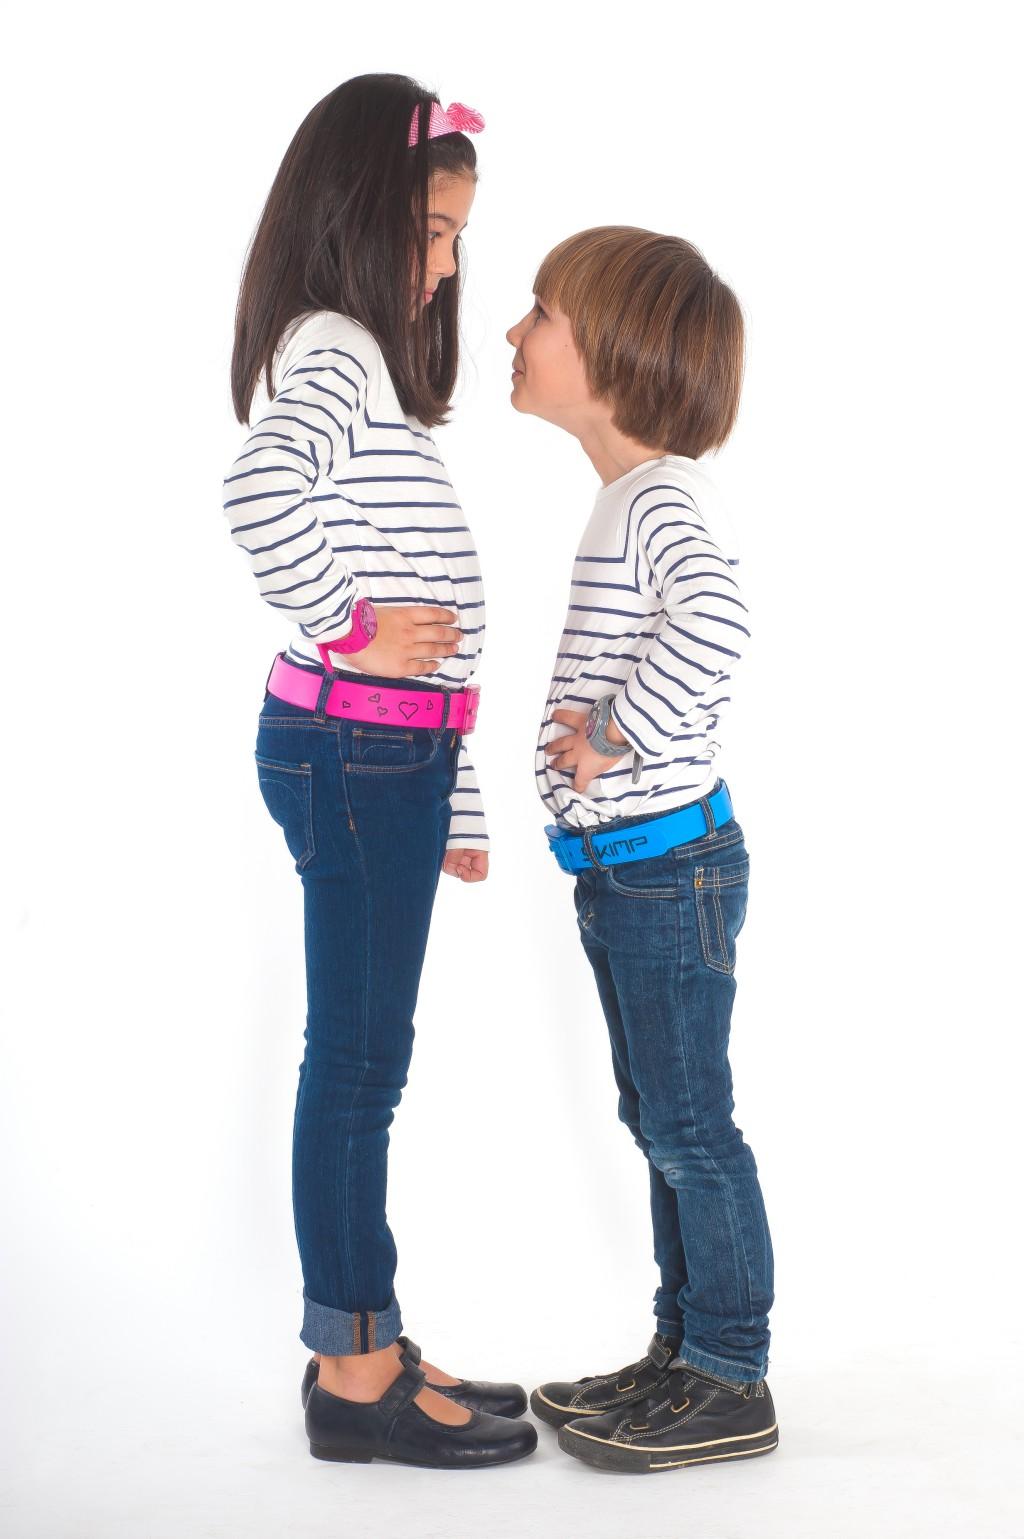 Skimp cinturon unisex sin metales para niños